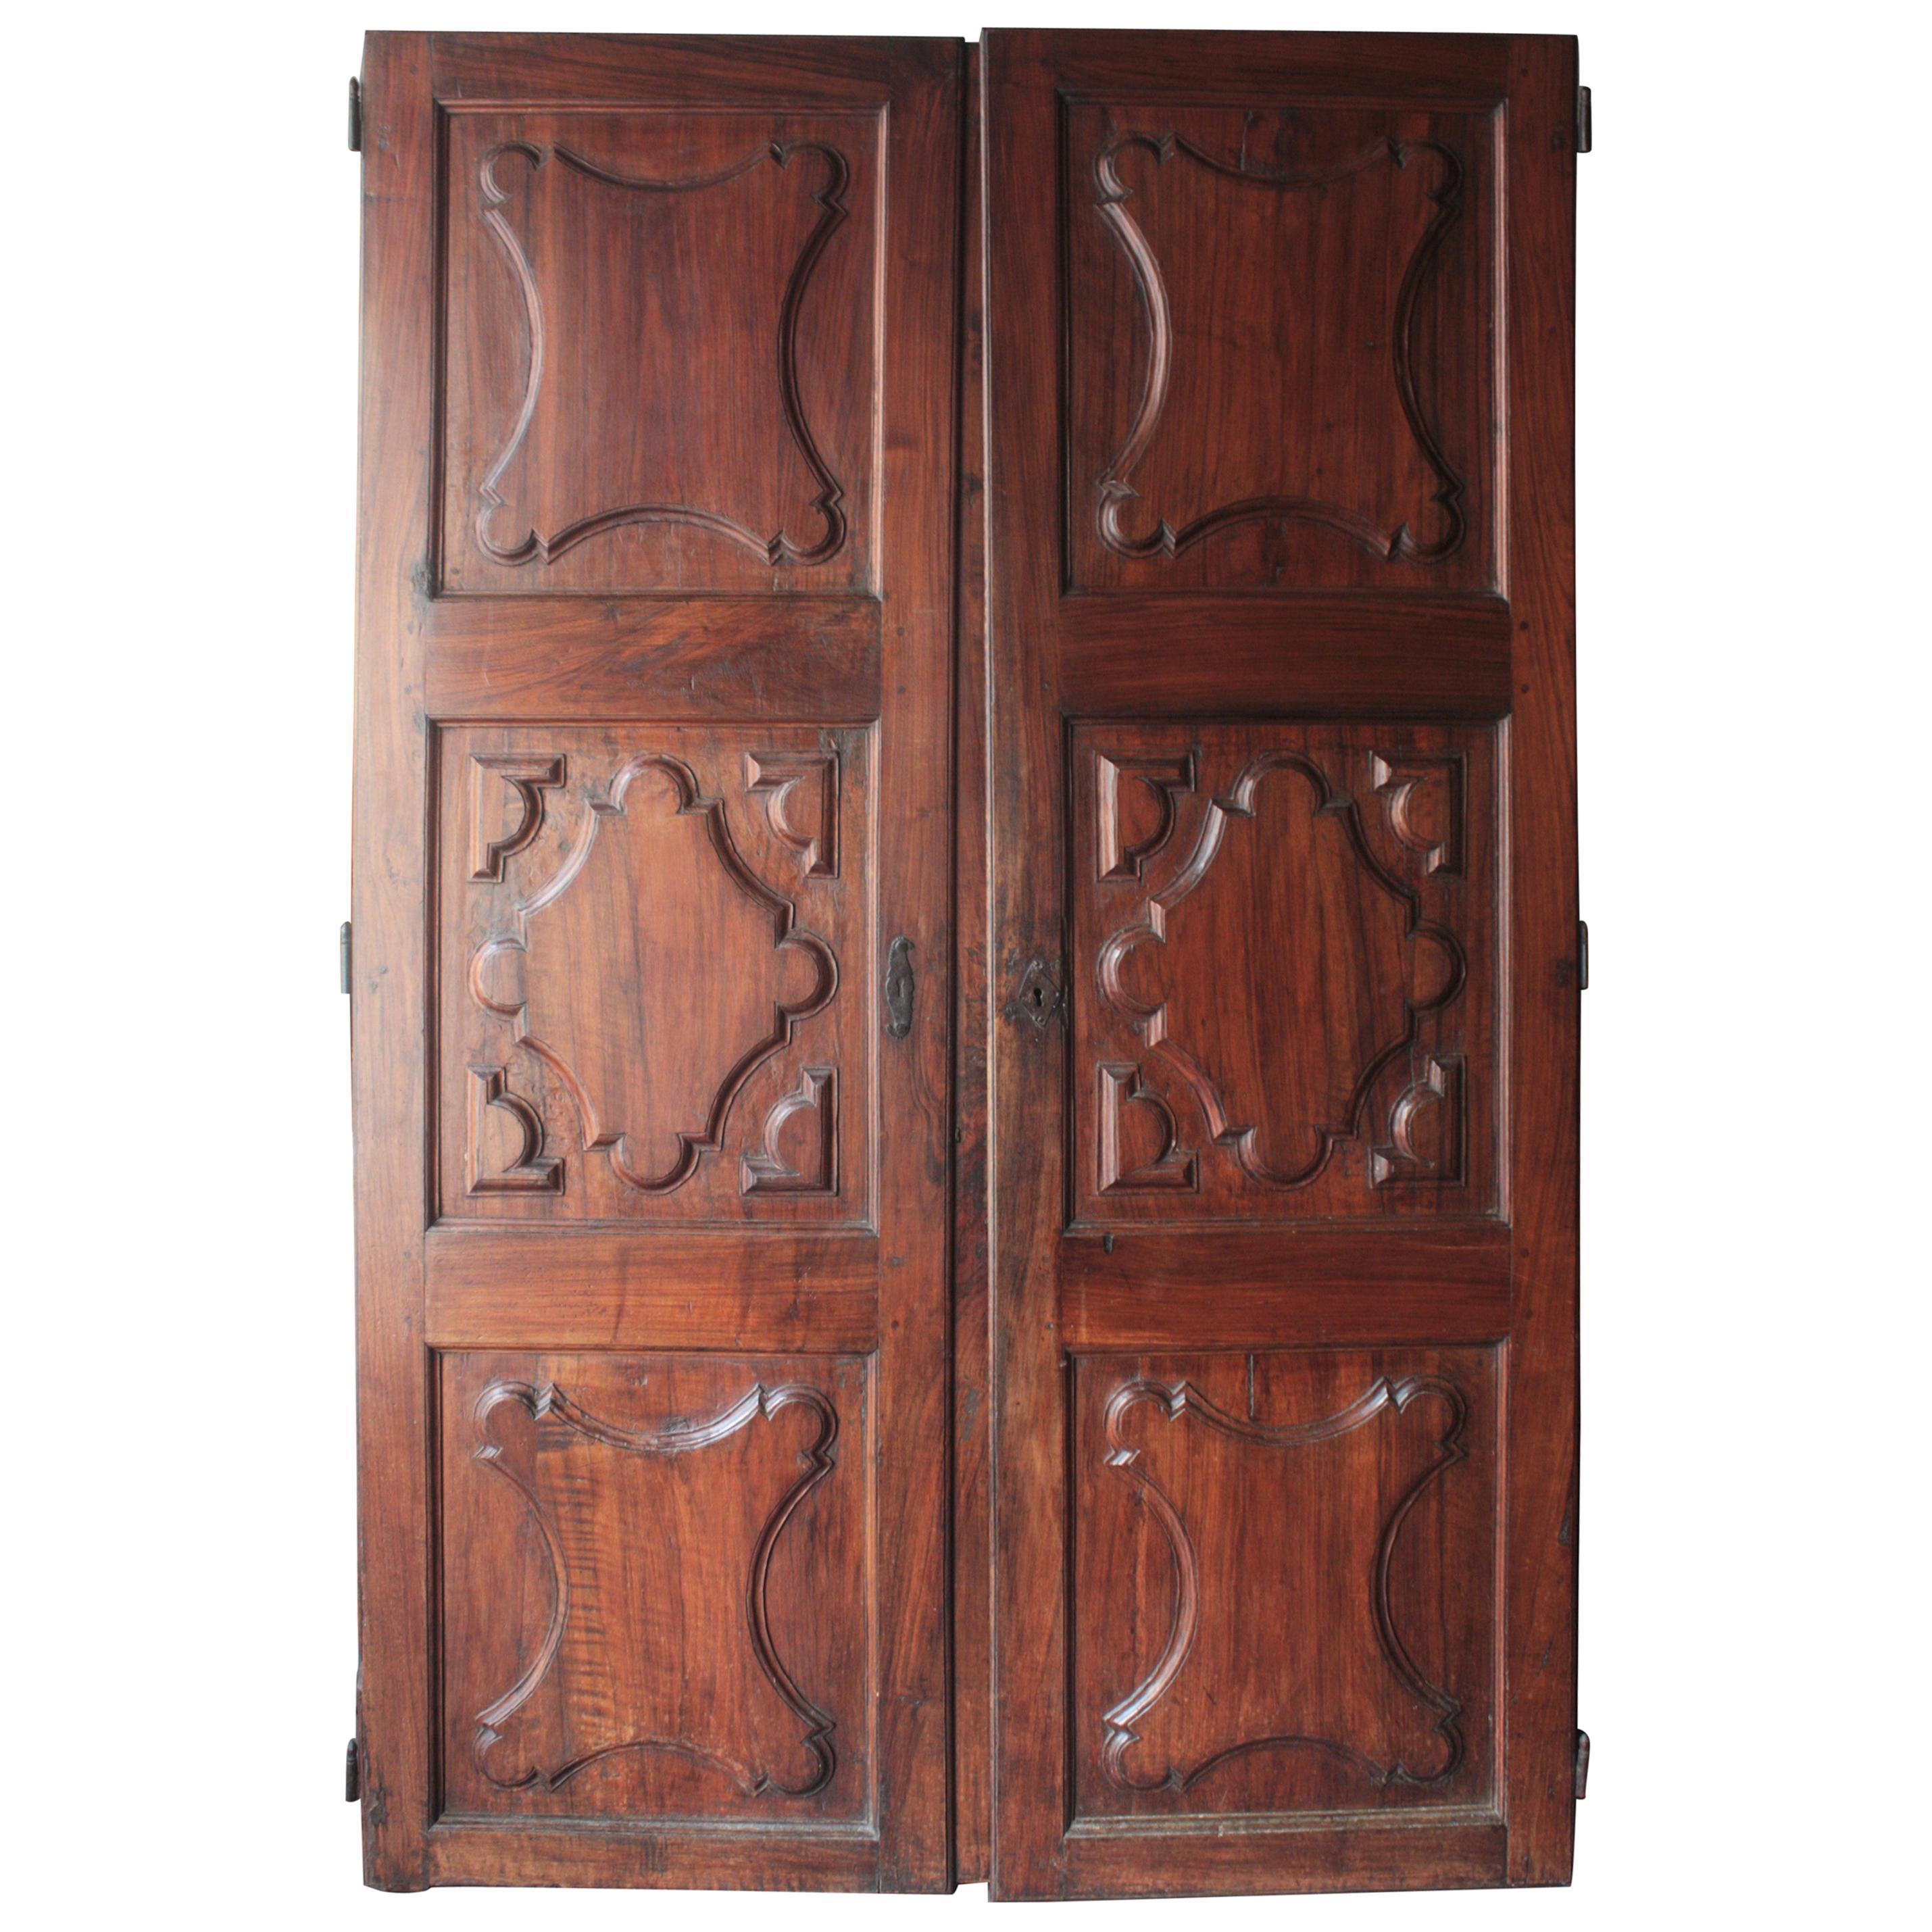 Spanish 18th Century Carved Walnut Wood Doors